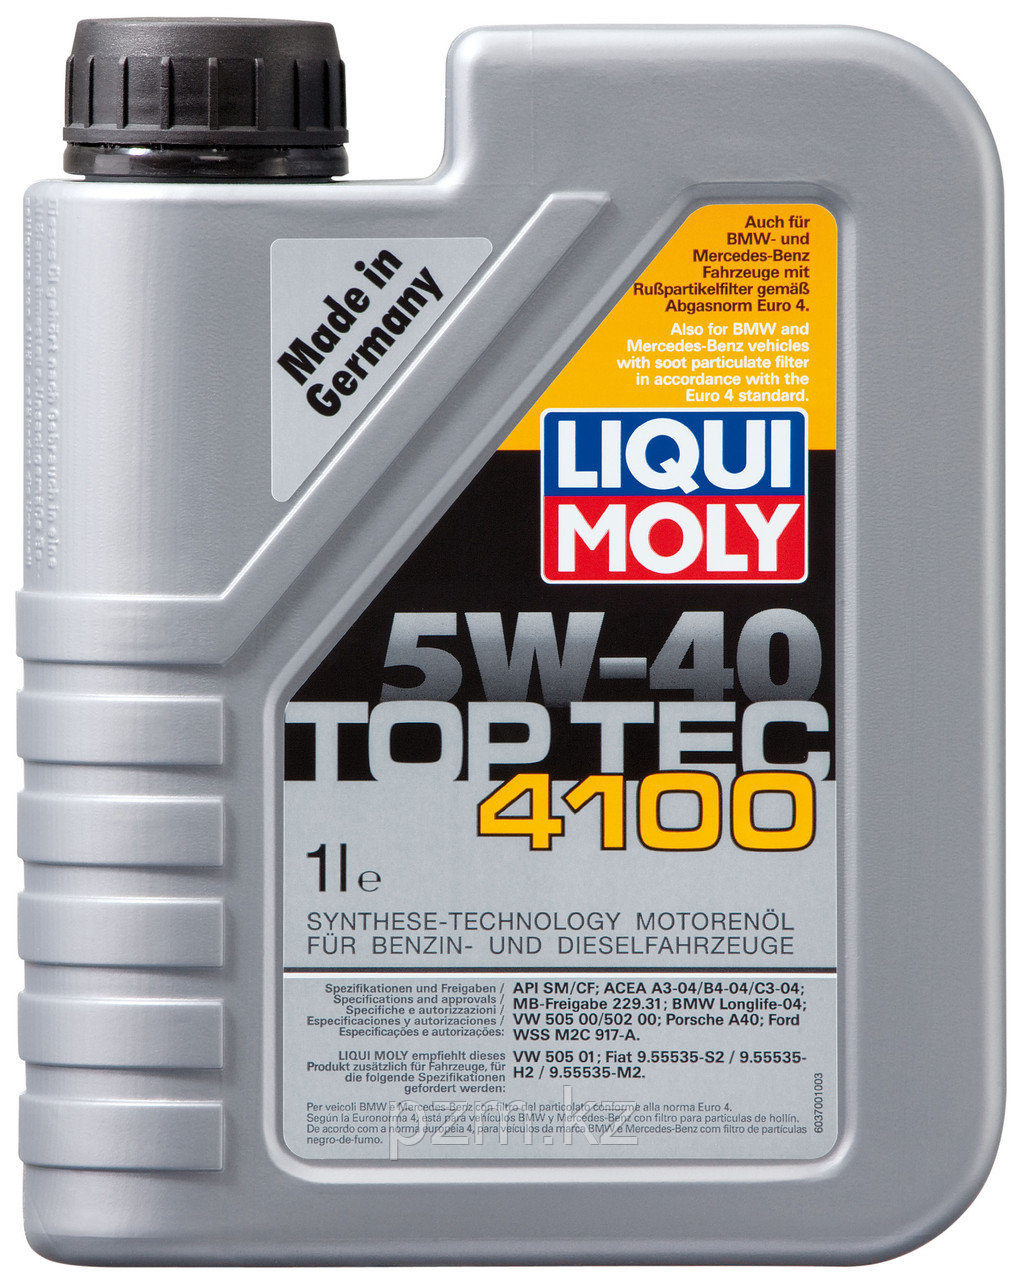 Синтетическое моторное масло Top Tec 4100 5W-40 1литр